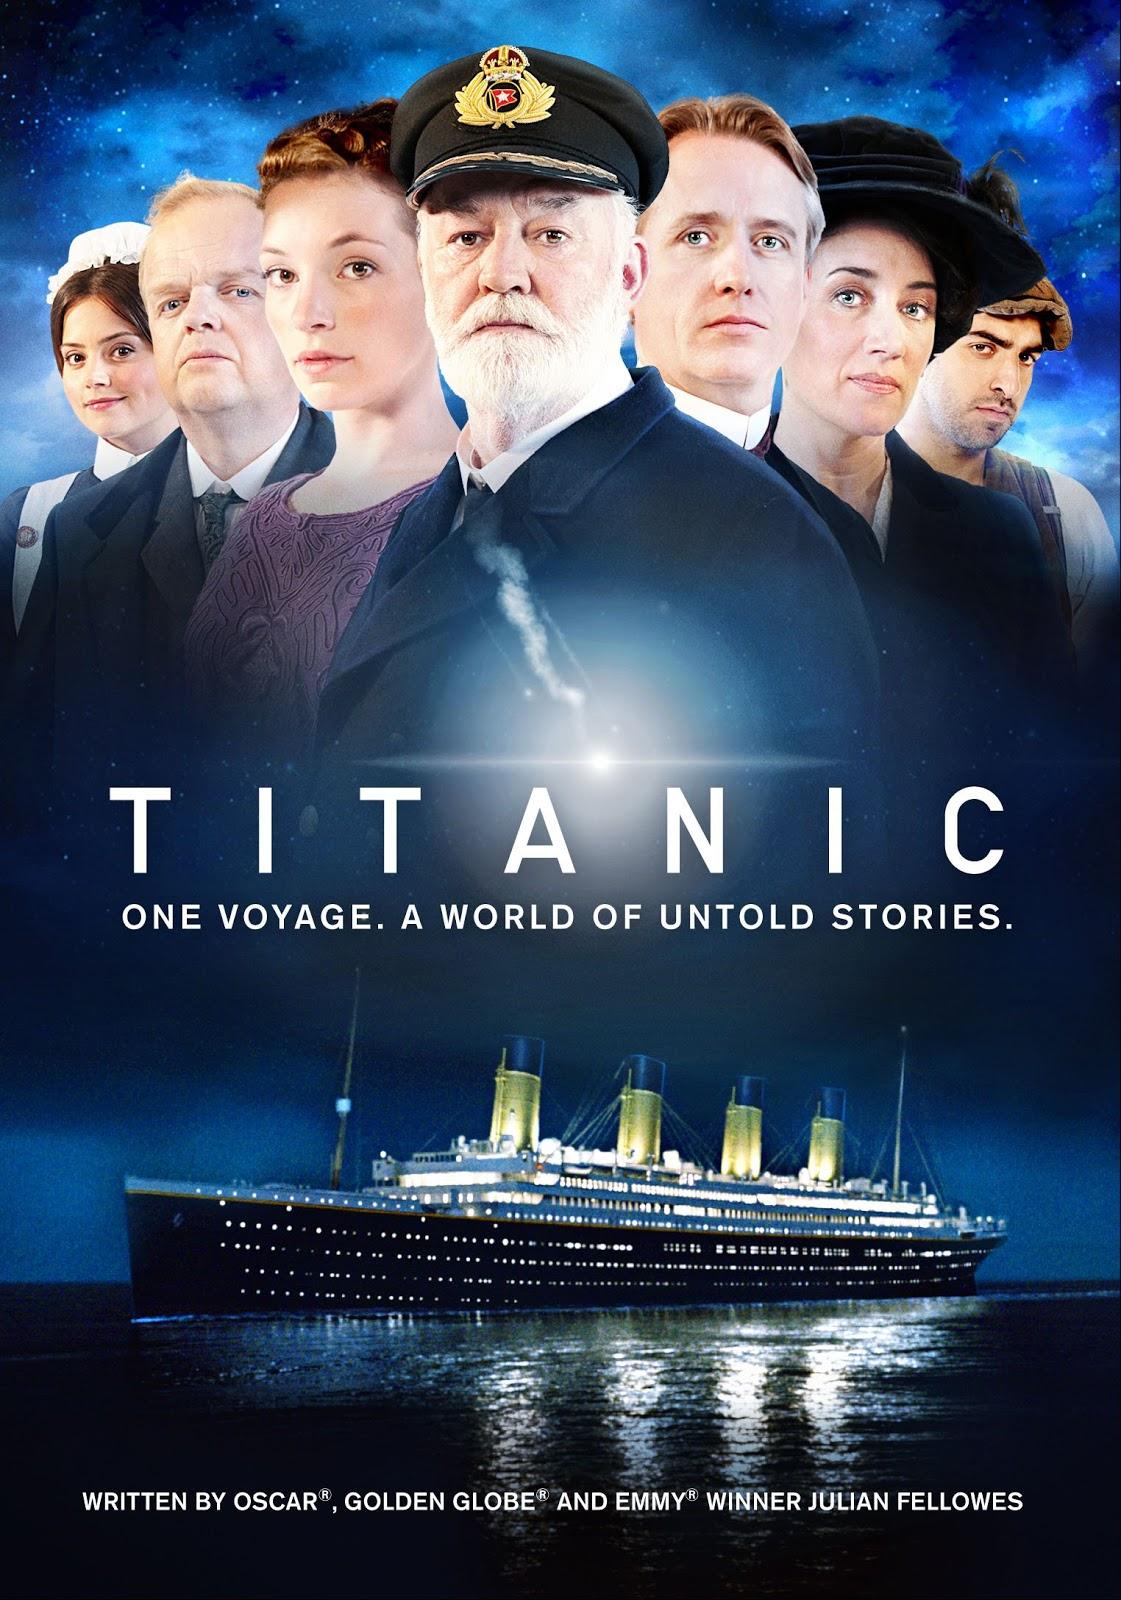 Titanic (2012 Miniseries)